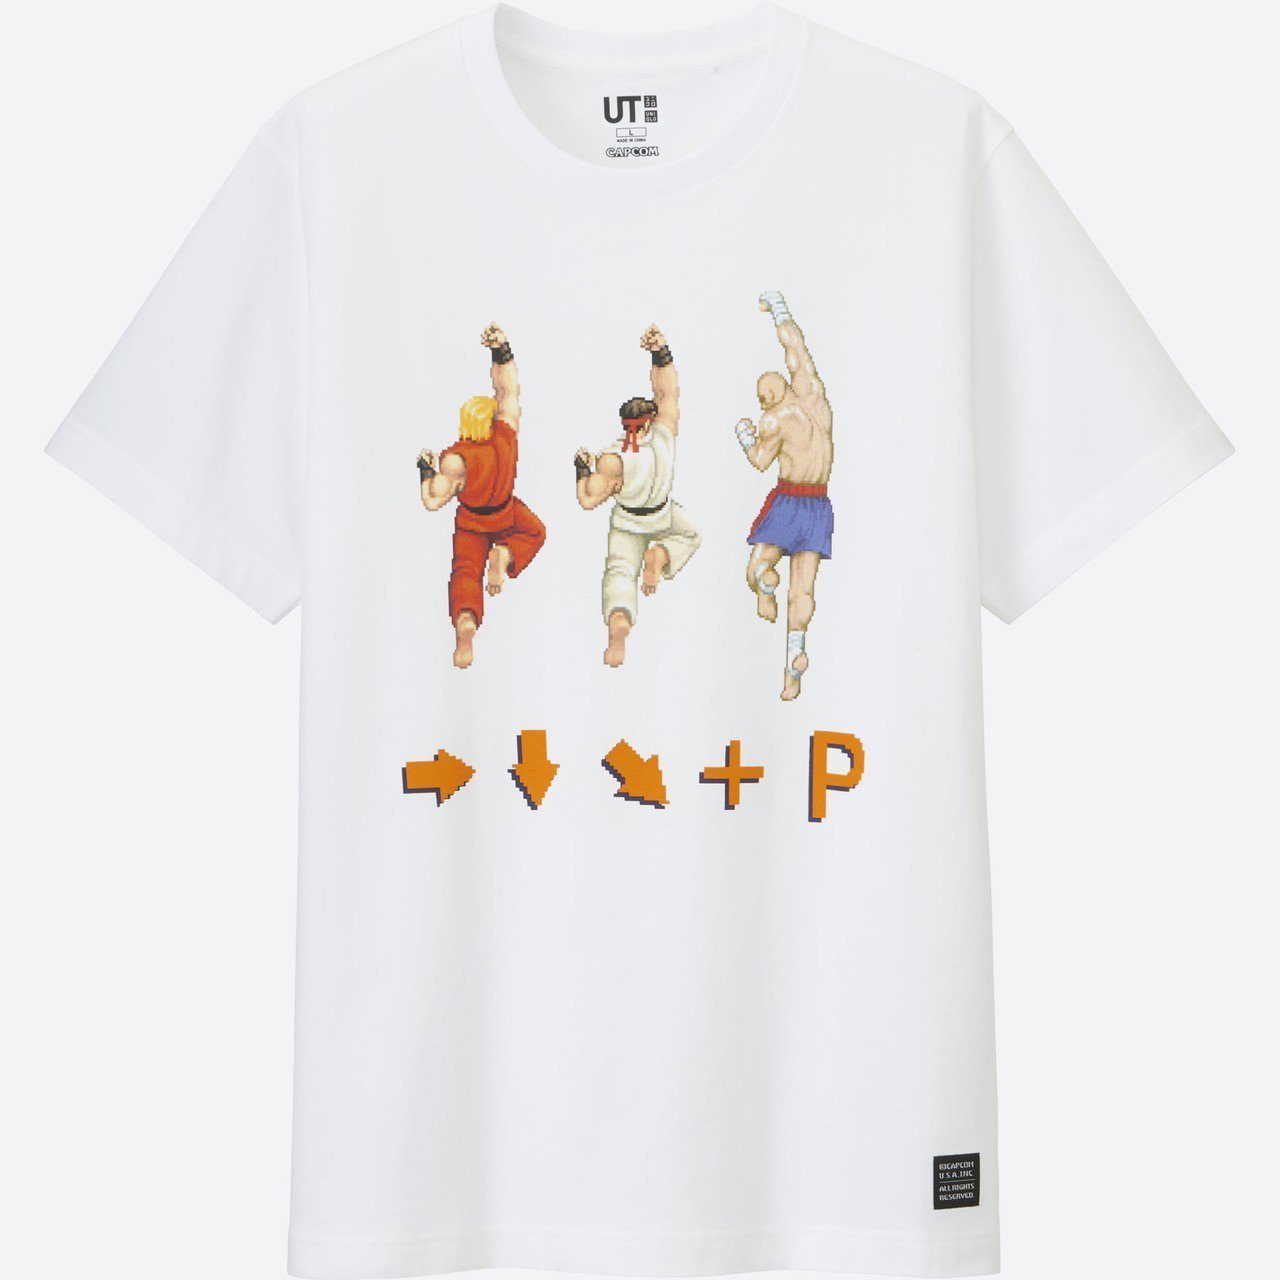 UNIQLO聯名《快打旋風》UT,售價590元。圖/UNIQLO提供